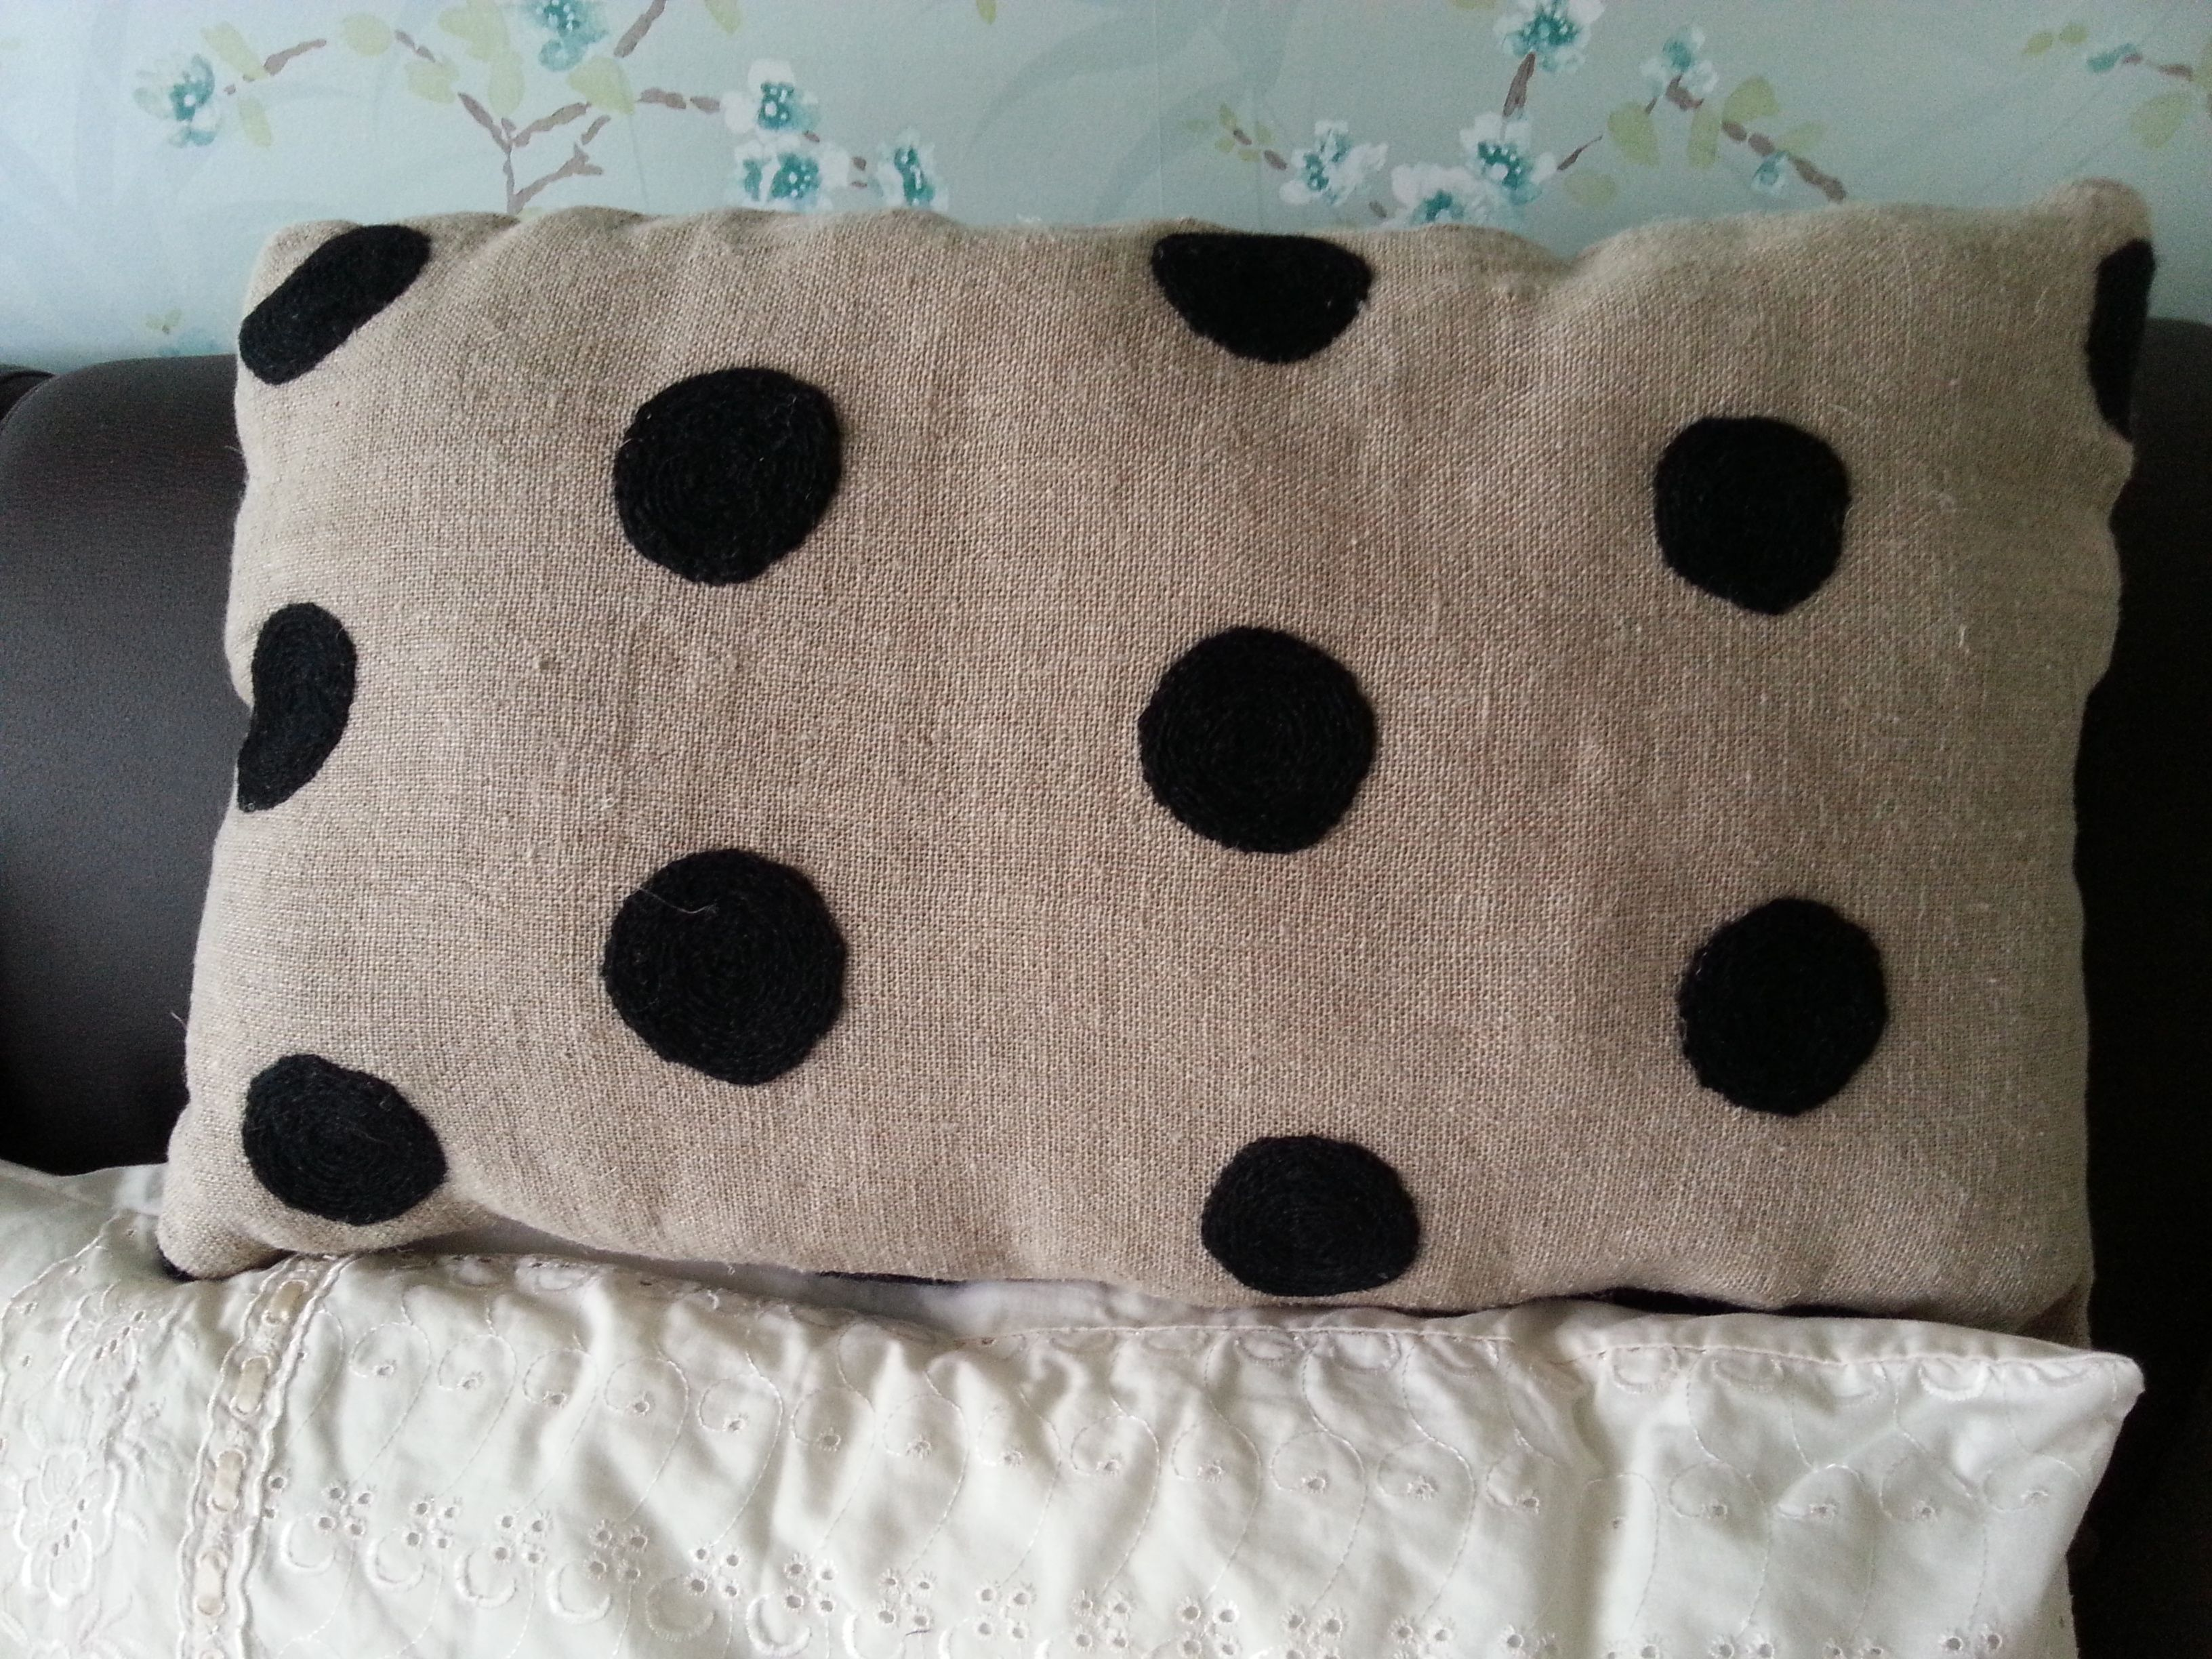 Handmade oblong cushion using a dark beige hessian type material